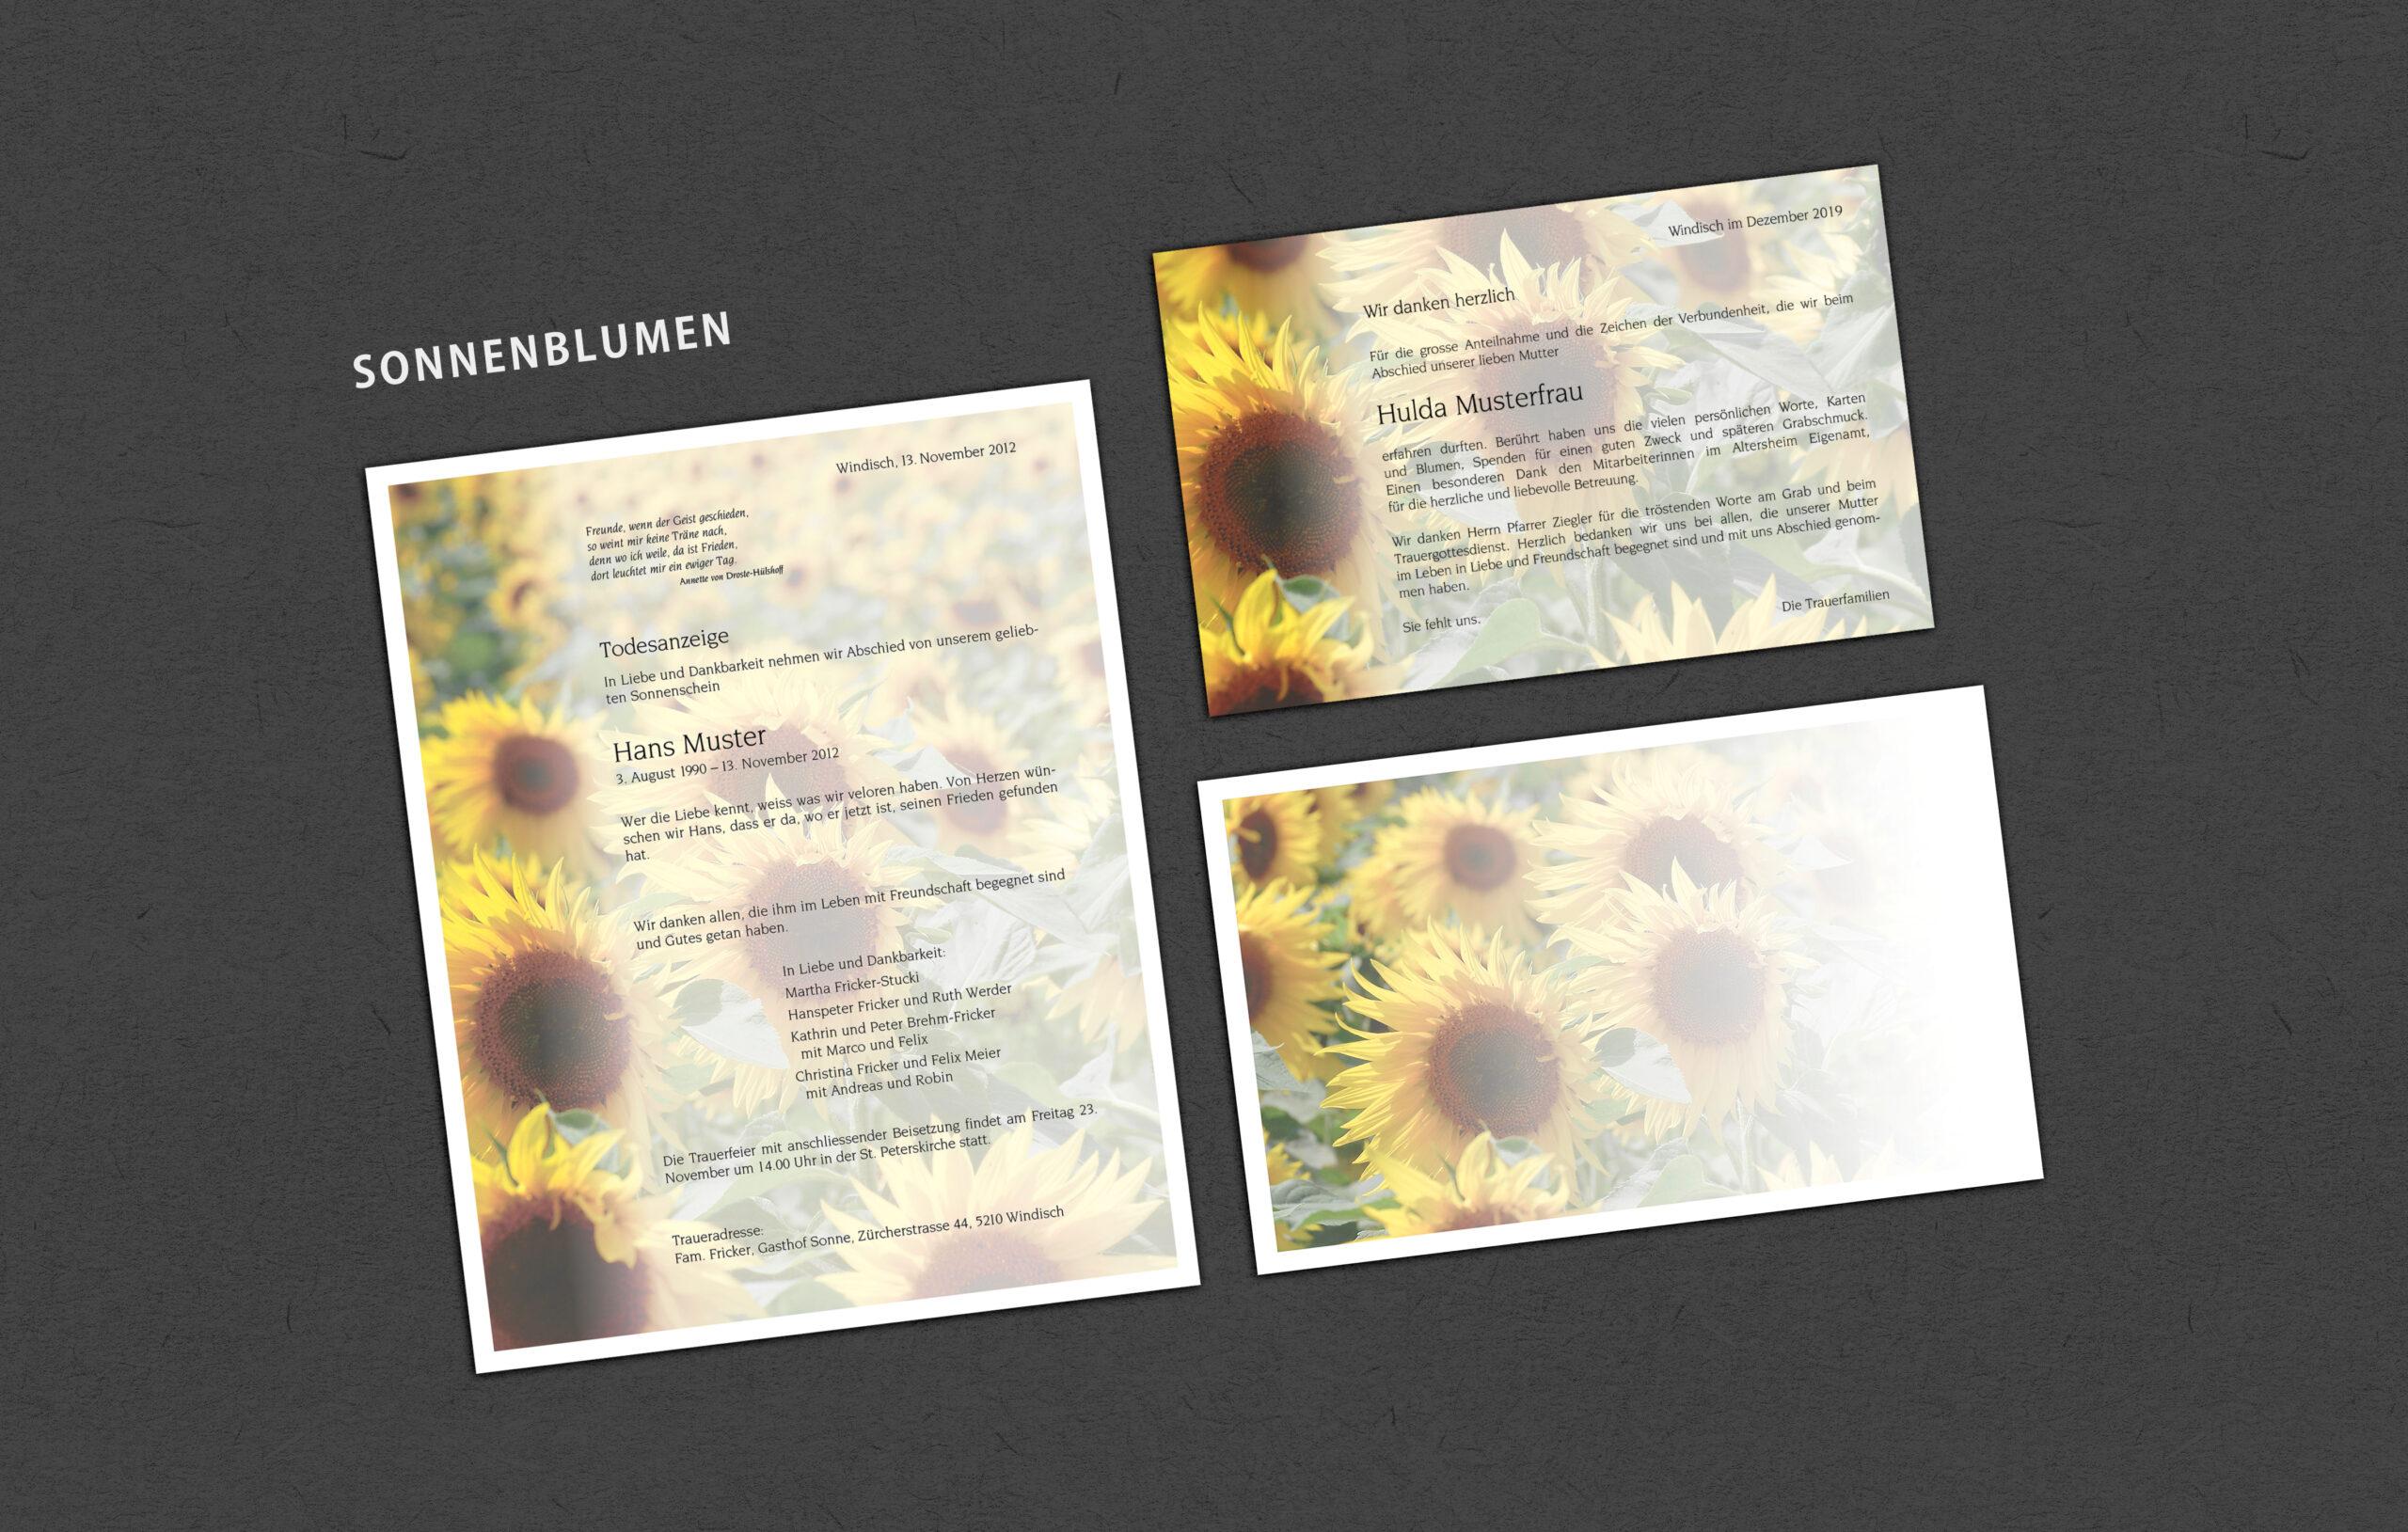 Muster_Sujet Sonnenblumen